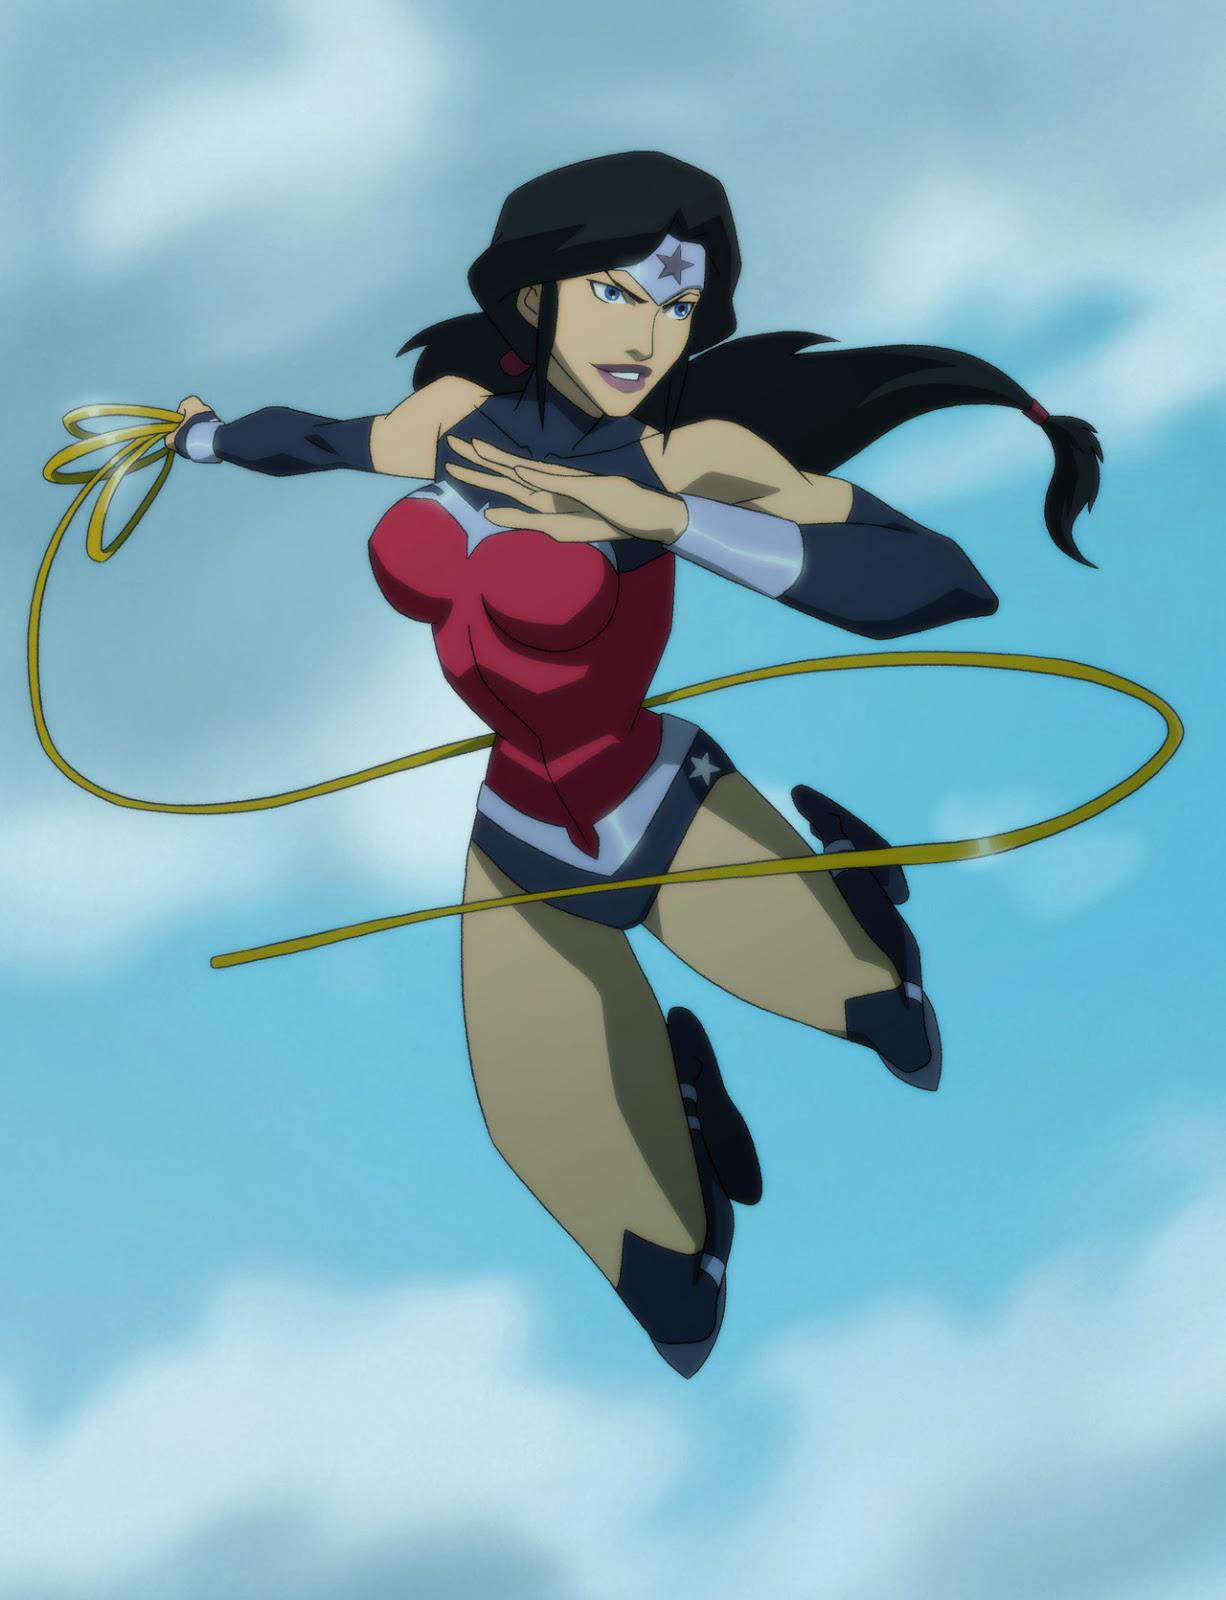 Batman Vs Superman  Gal Gadot Is Wonder Woman  Teaser Trailer-8421